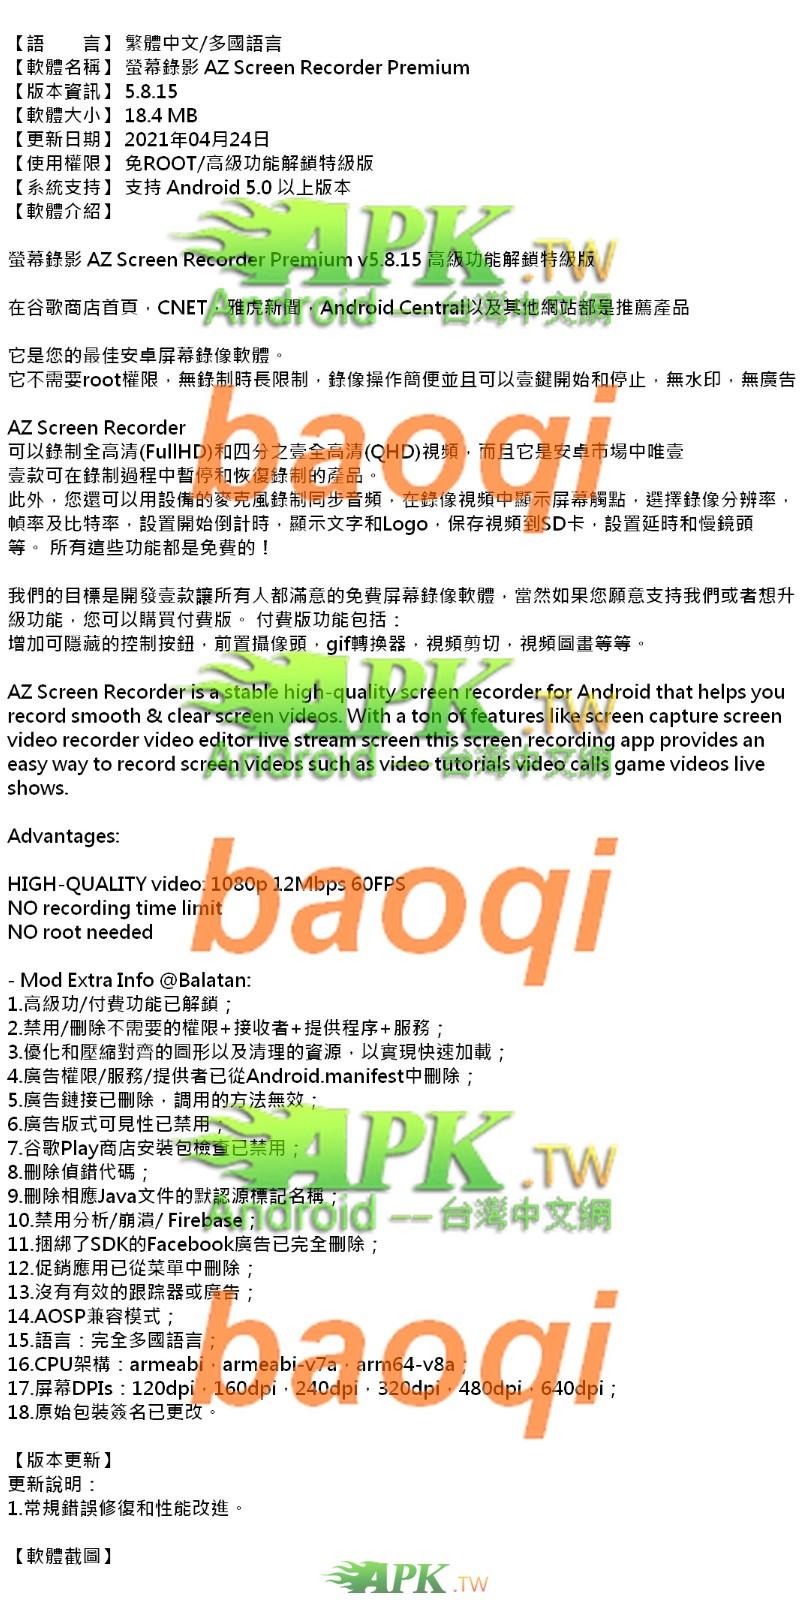 AZ_ScreenRecorder_Premium_5.8.15_.jpg